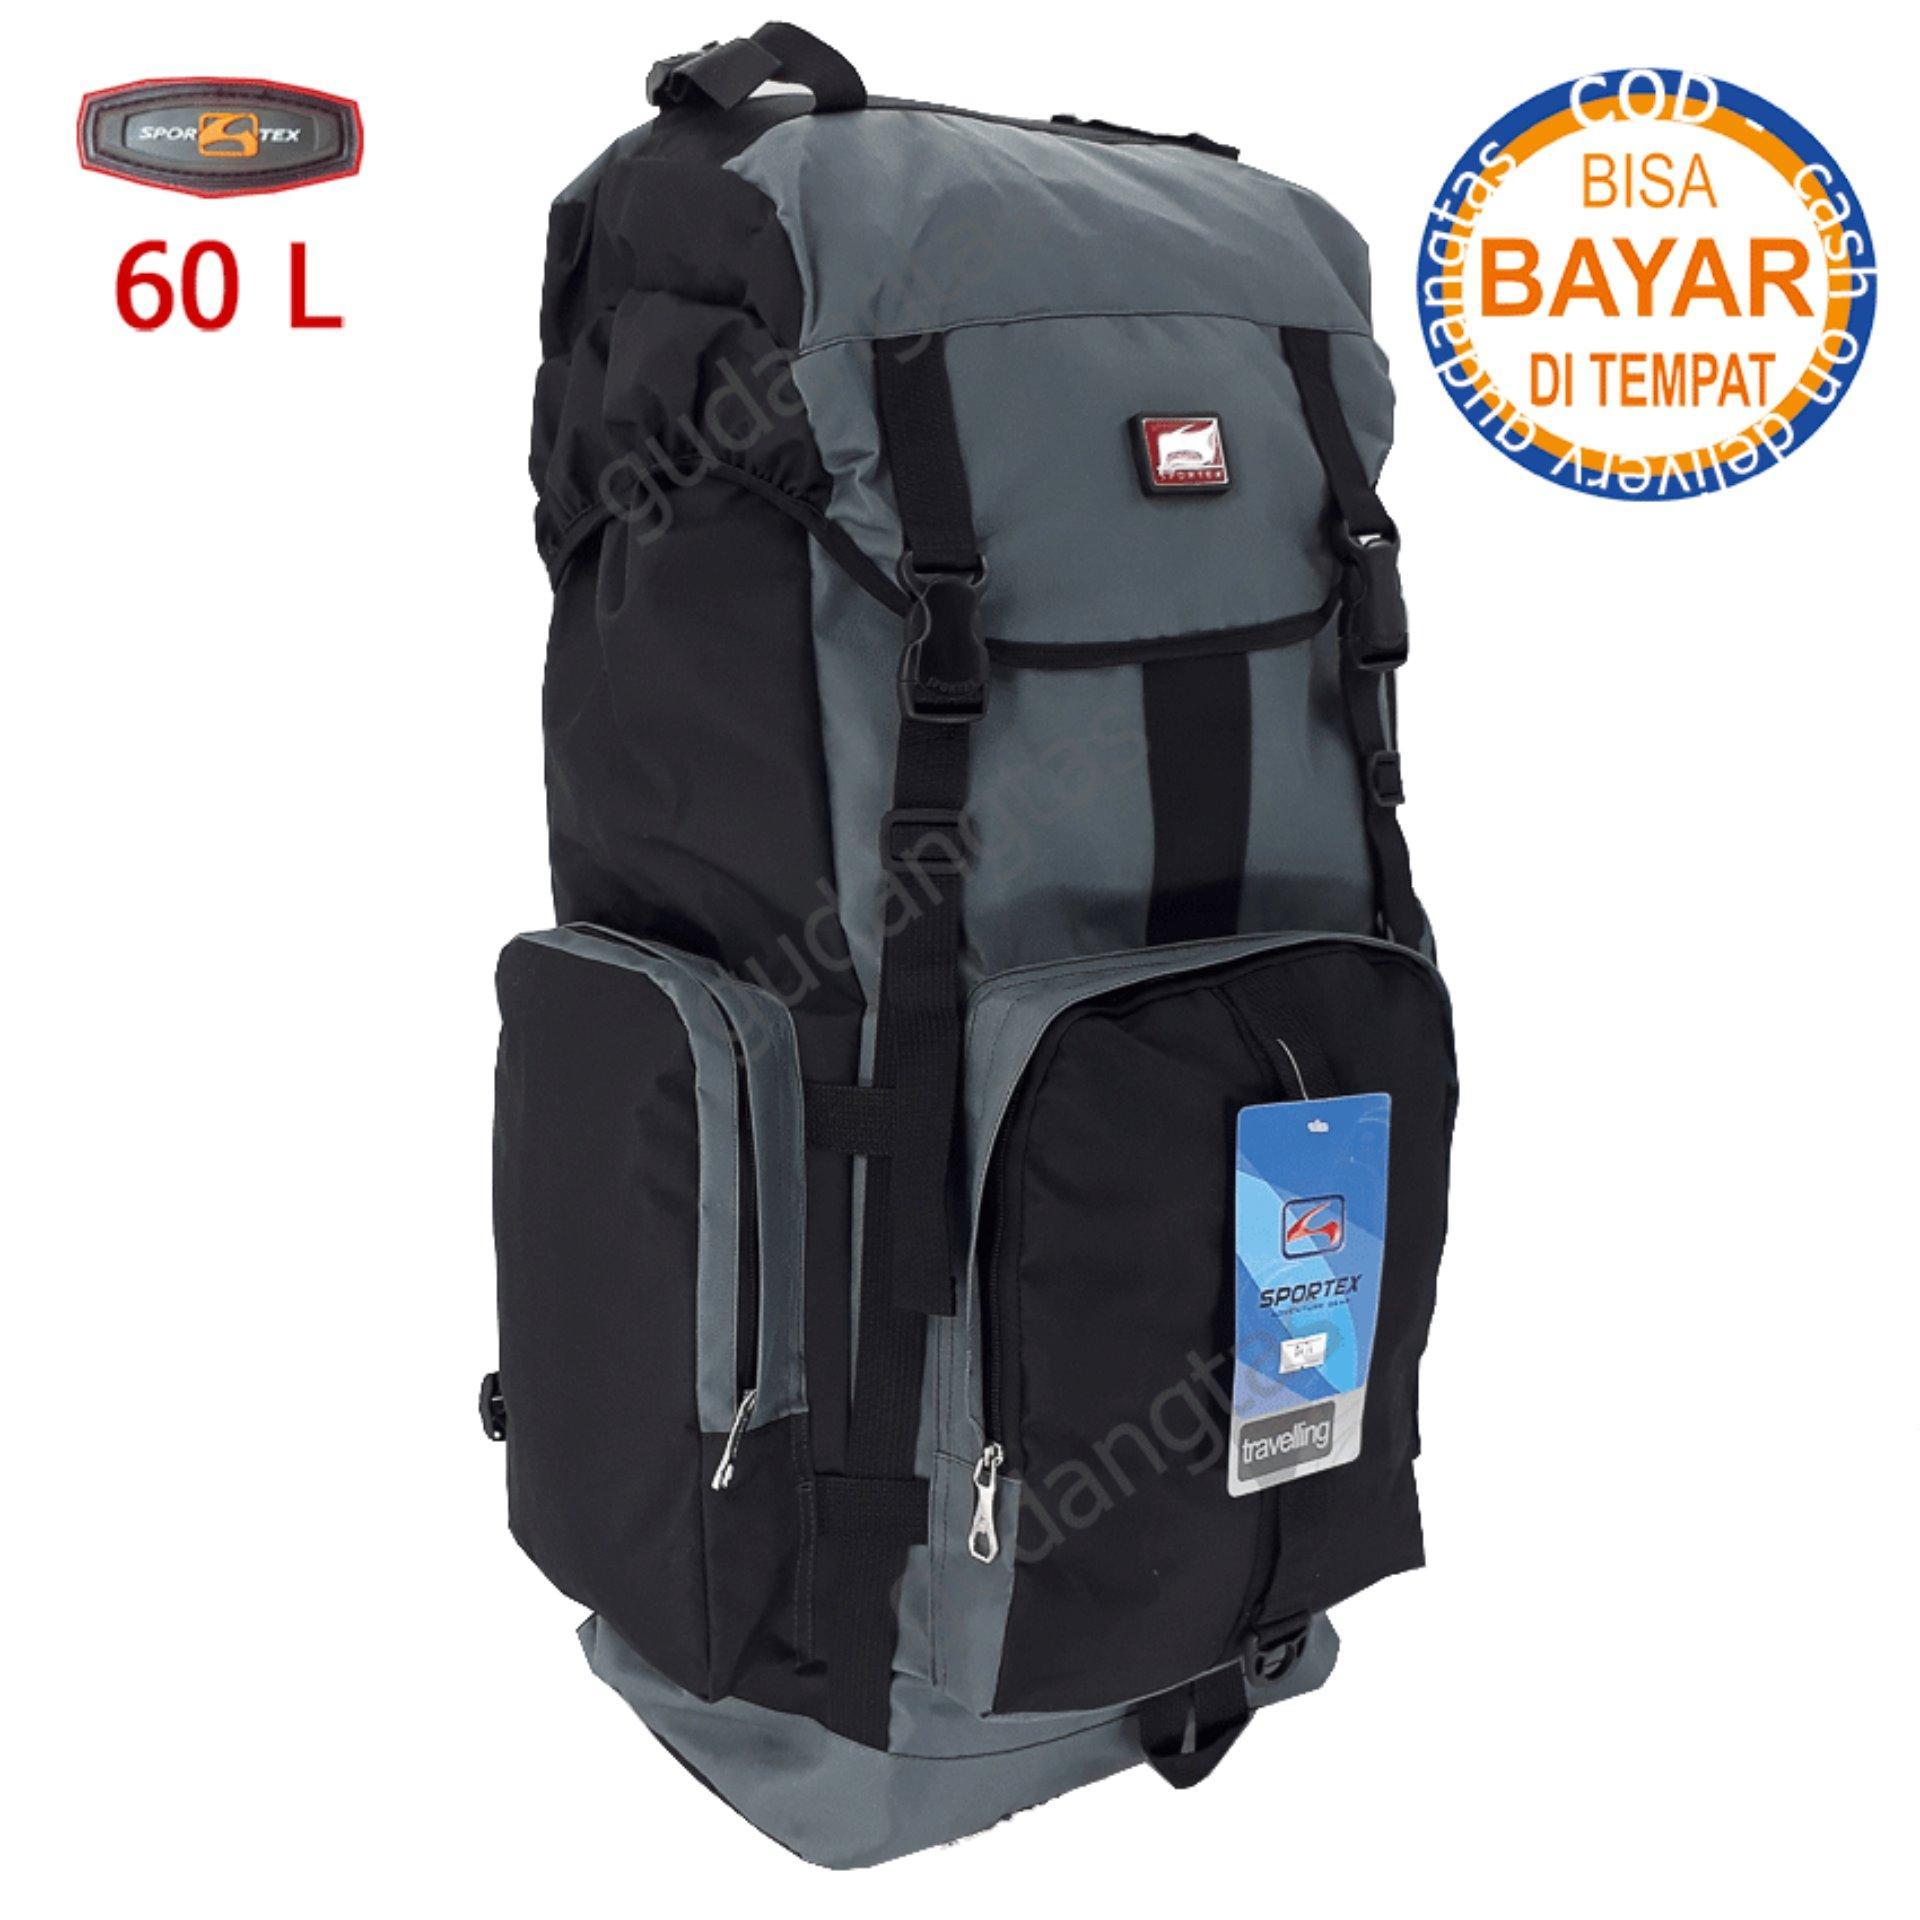 Sportex Tas Gunung Tas Keril Tas Carrier Tas Camping Tas Hiking 60L 04W4 Abu kombinasi Hitam